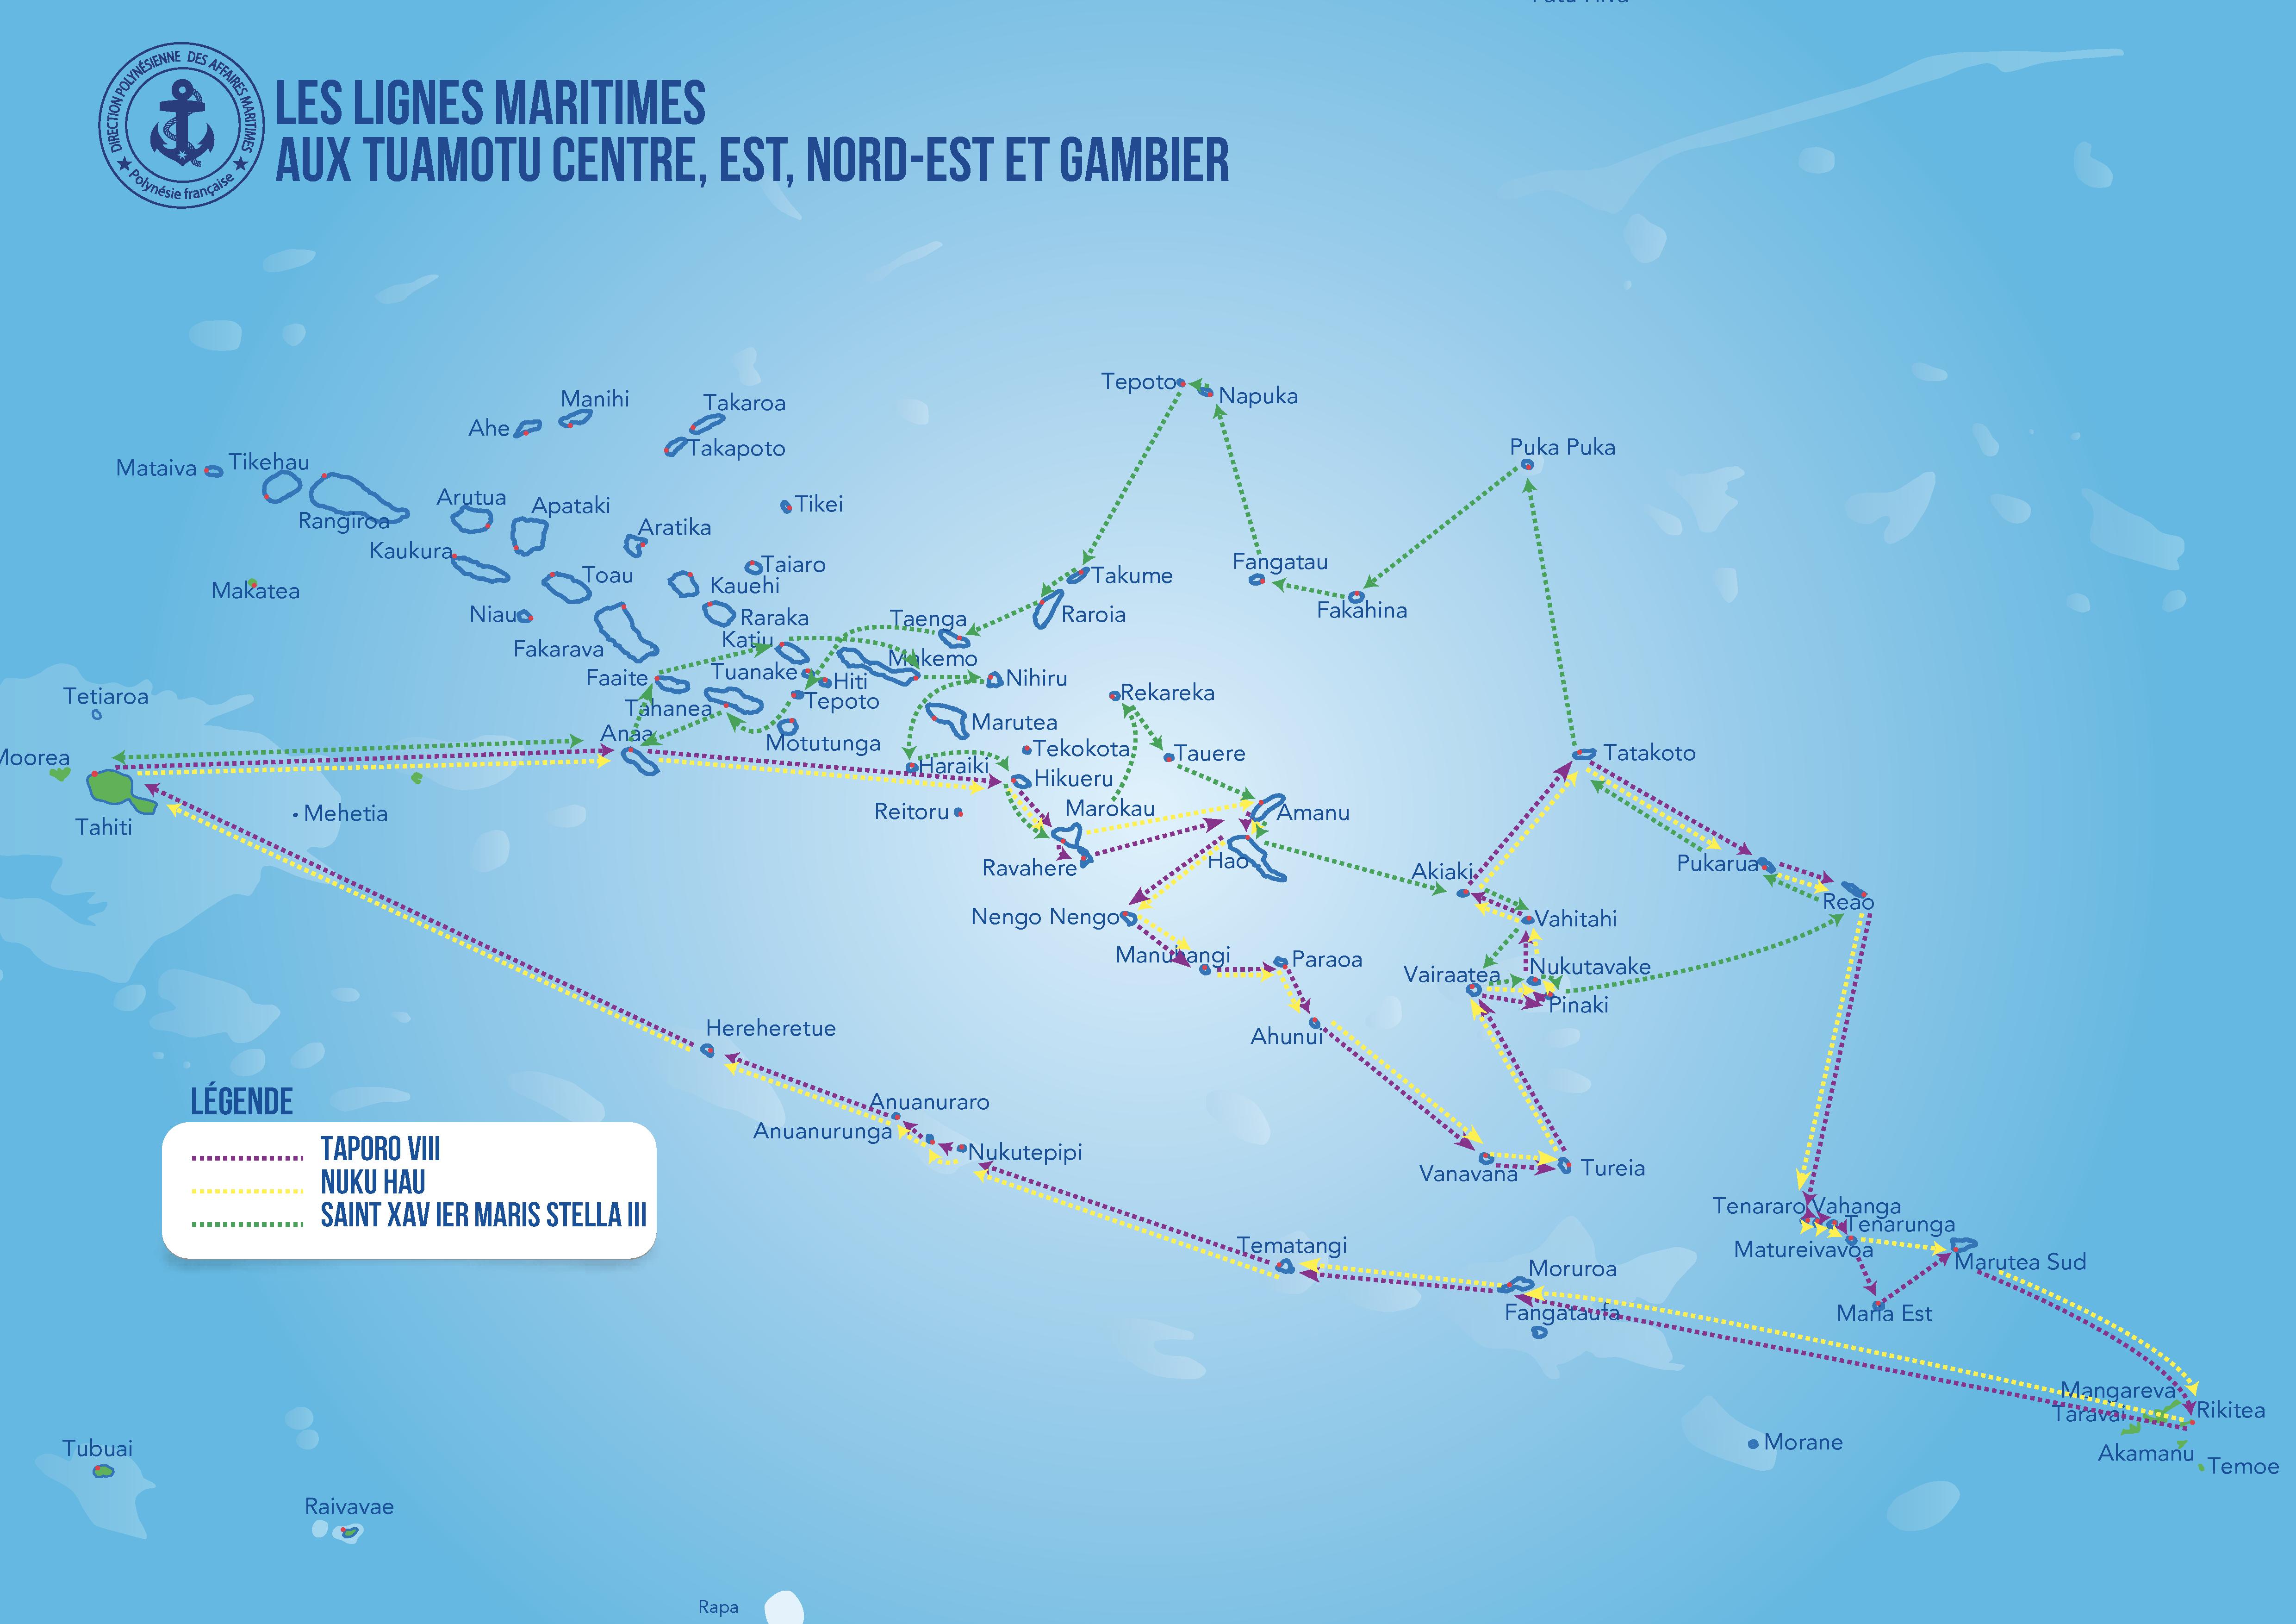 Carte Tuamotu Centre Est Nord Est Gambier Atlas 2018 Direction Affaires Maritimes Polynesie Tahiti